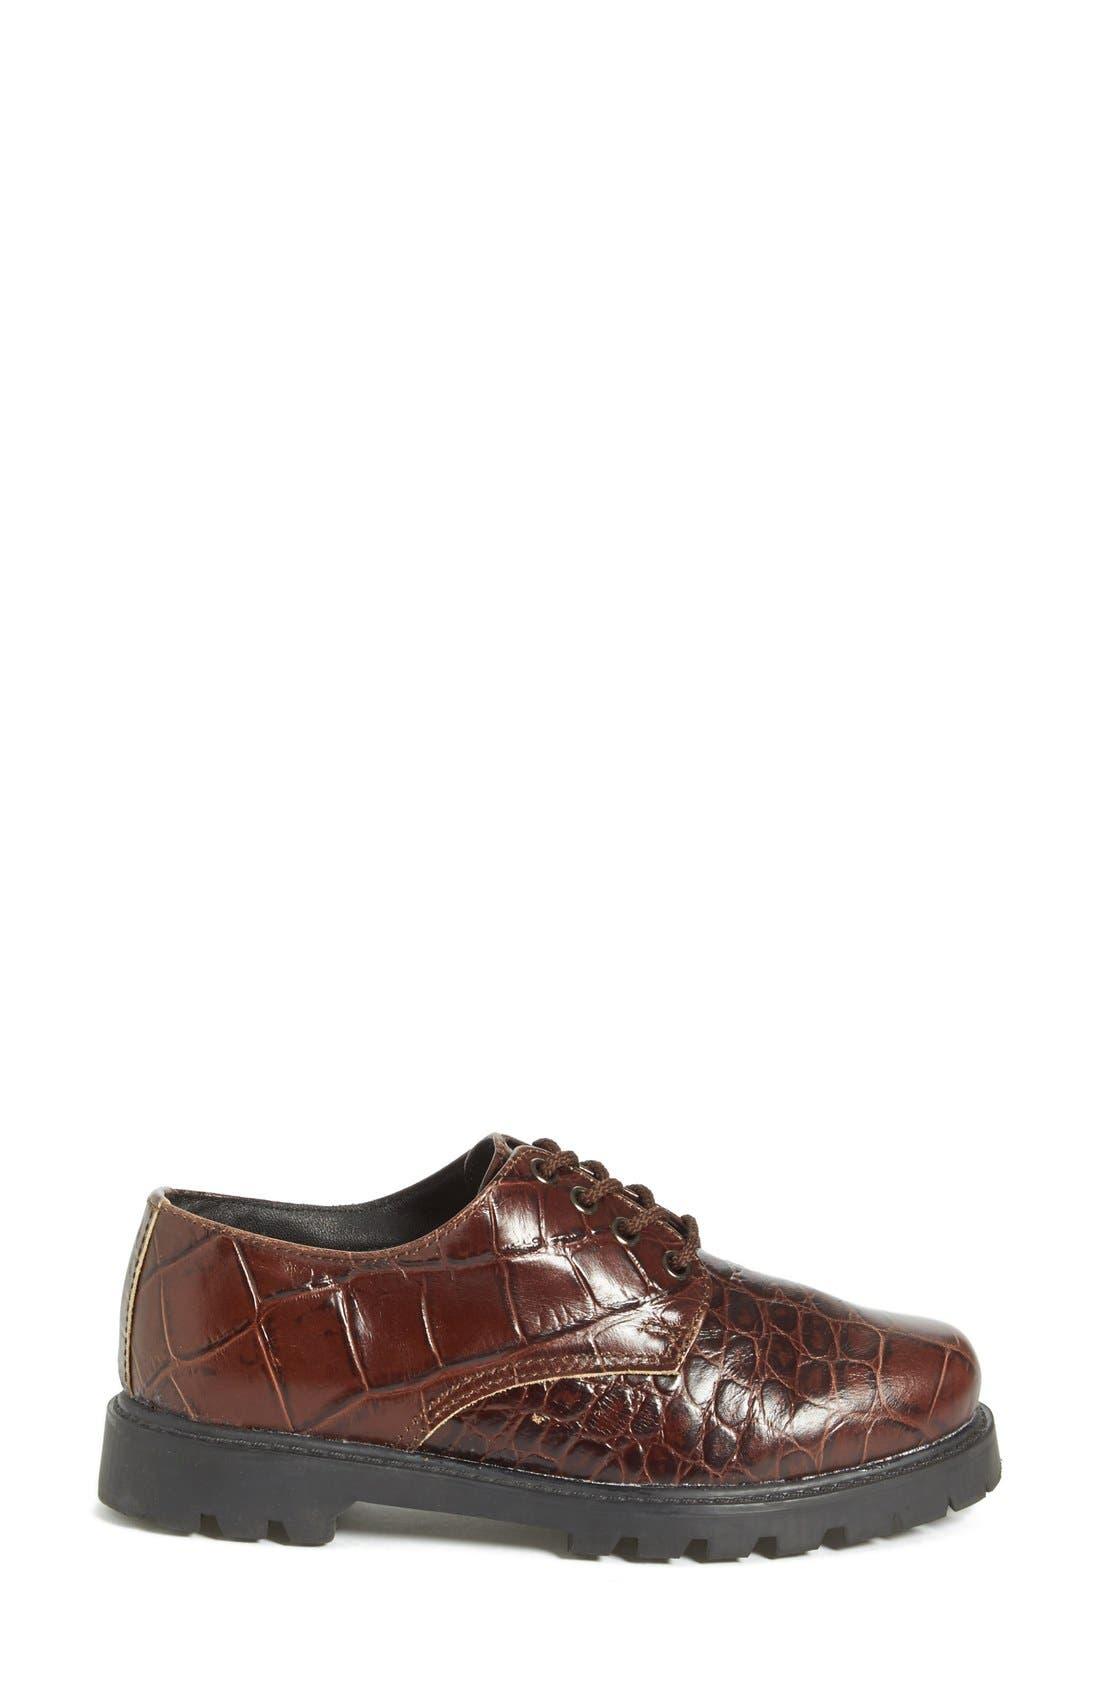 'School Shoe' Lace-Up Oxford,                             Alternate thumbnail 3, color,                             210